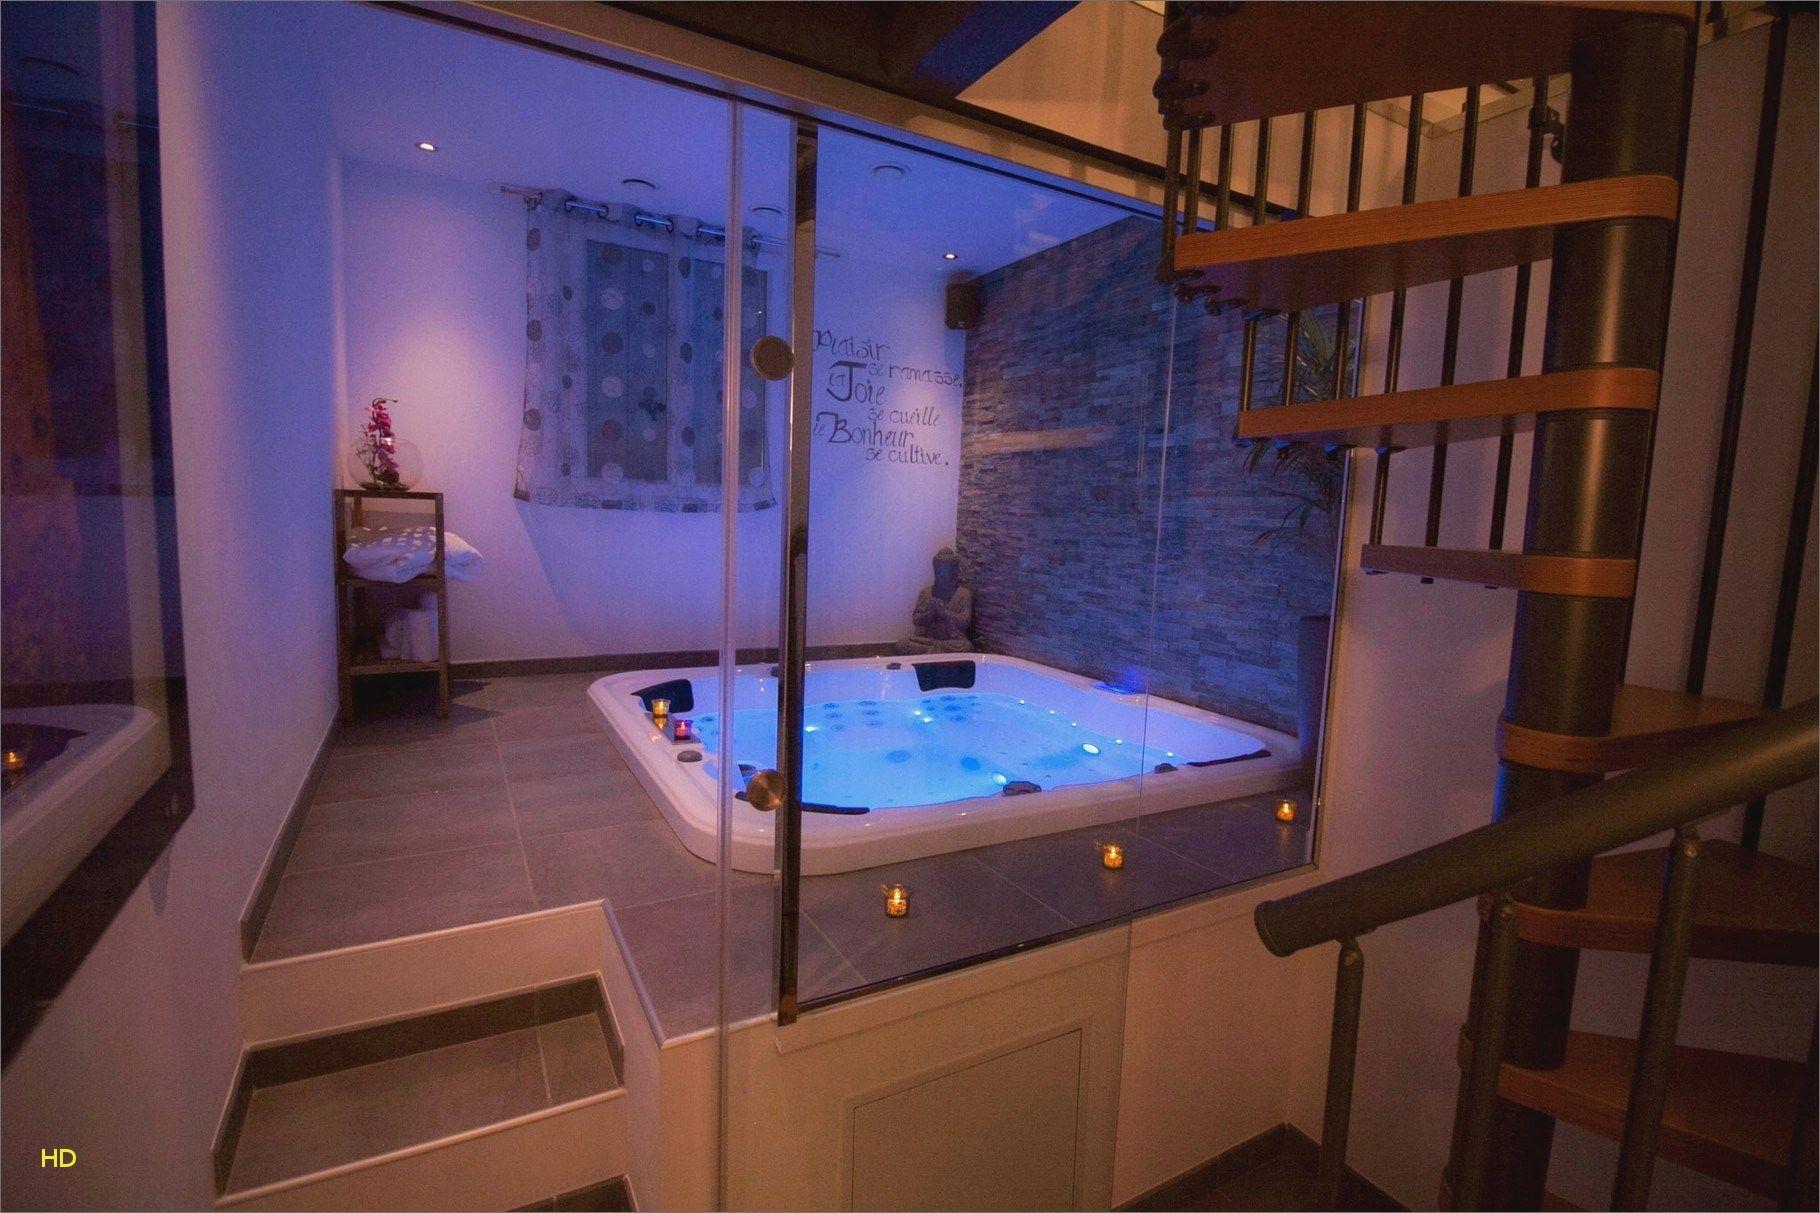 New Hotel Lyon Jacuzzi Privatif Chambre Spa Privatif Jacuzzi